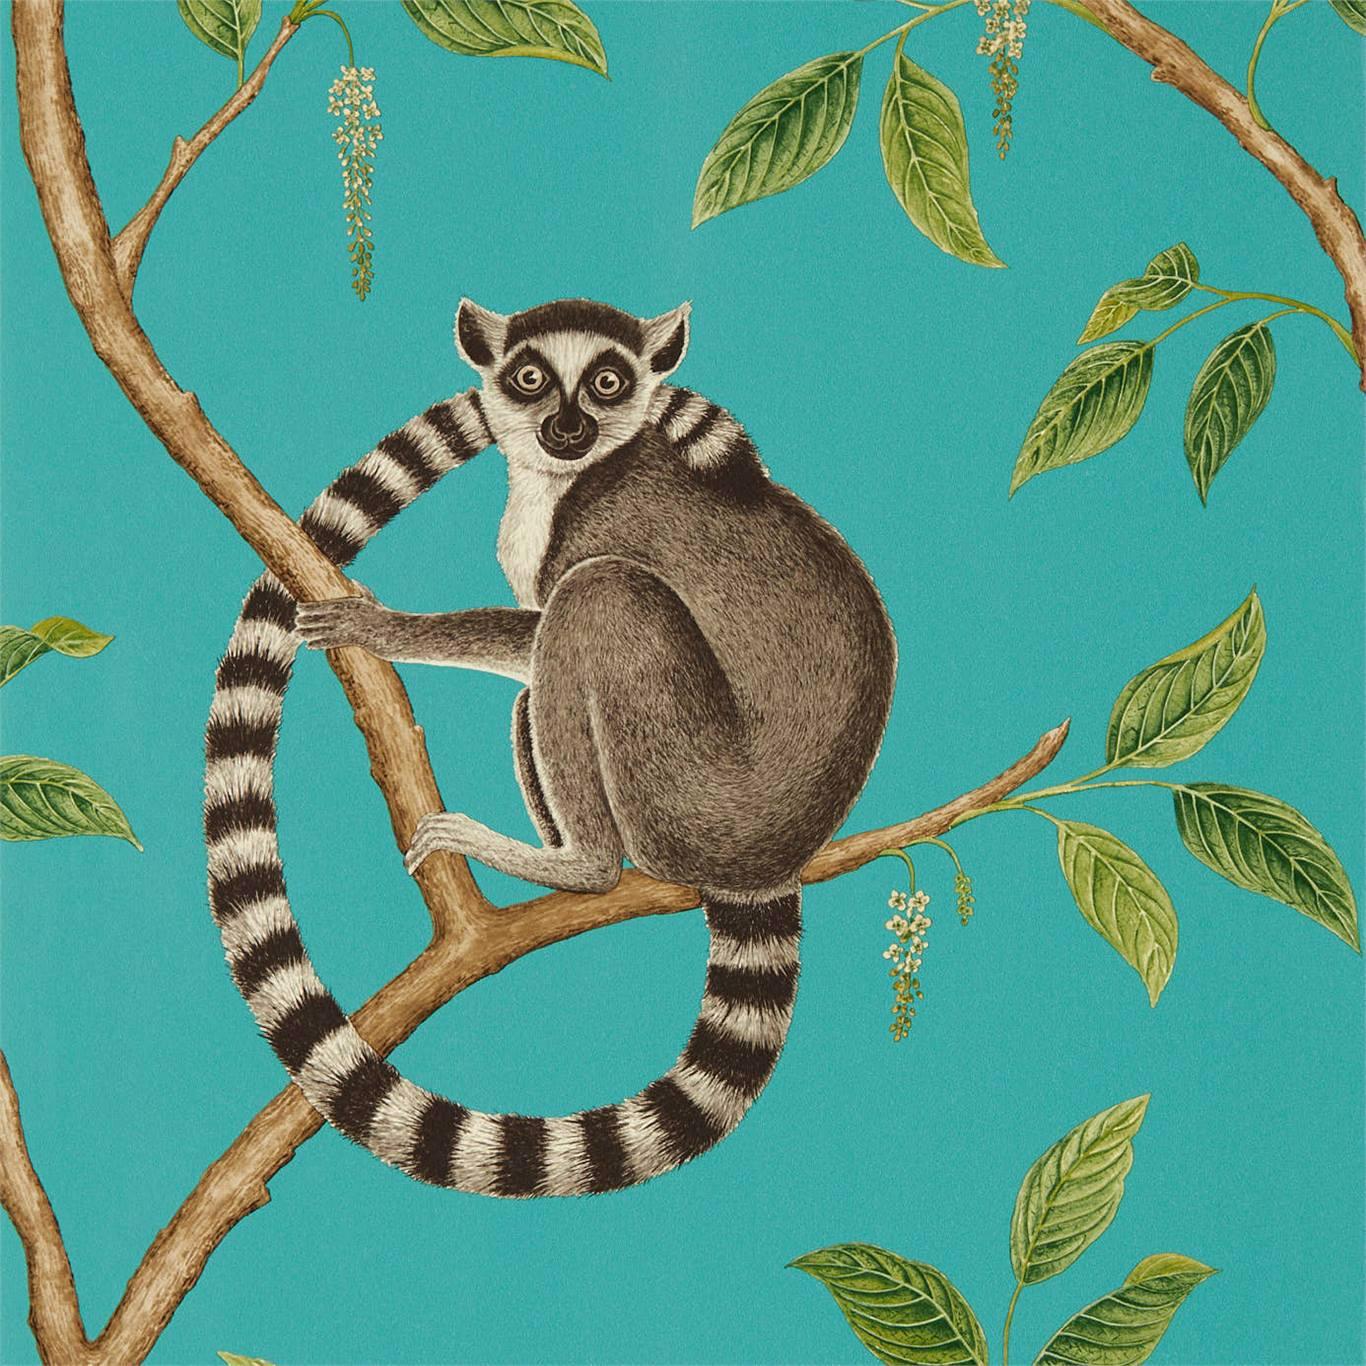 Ringtailed Lemur by SAN